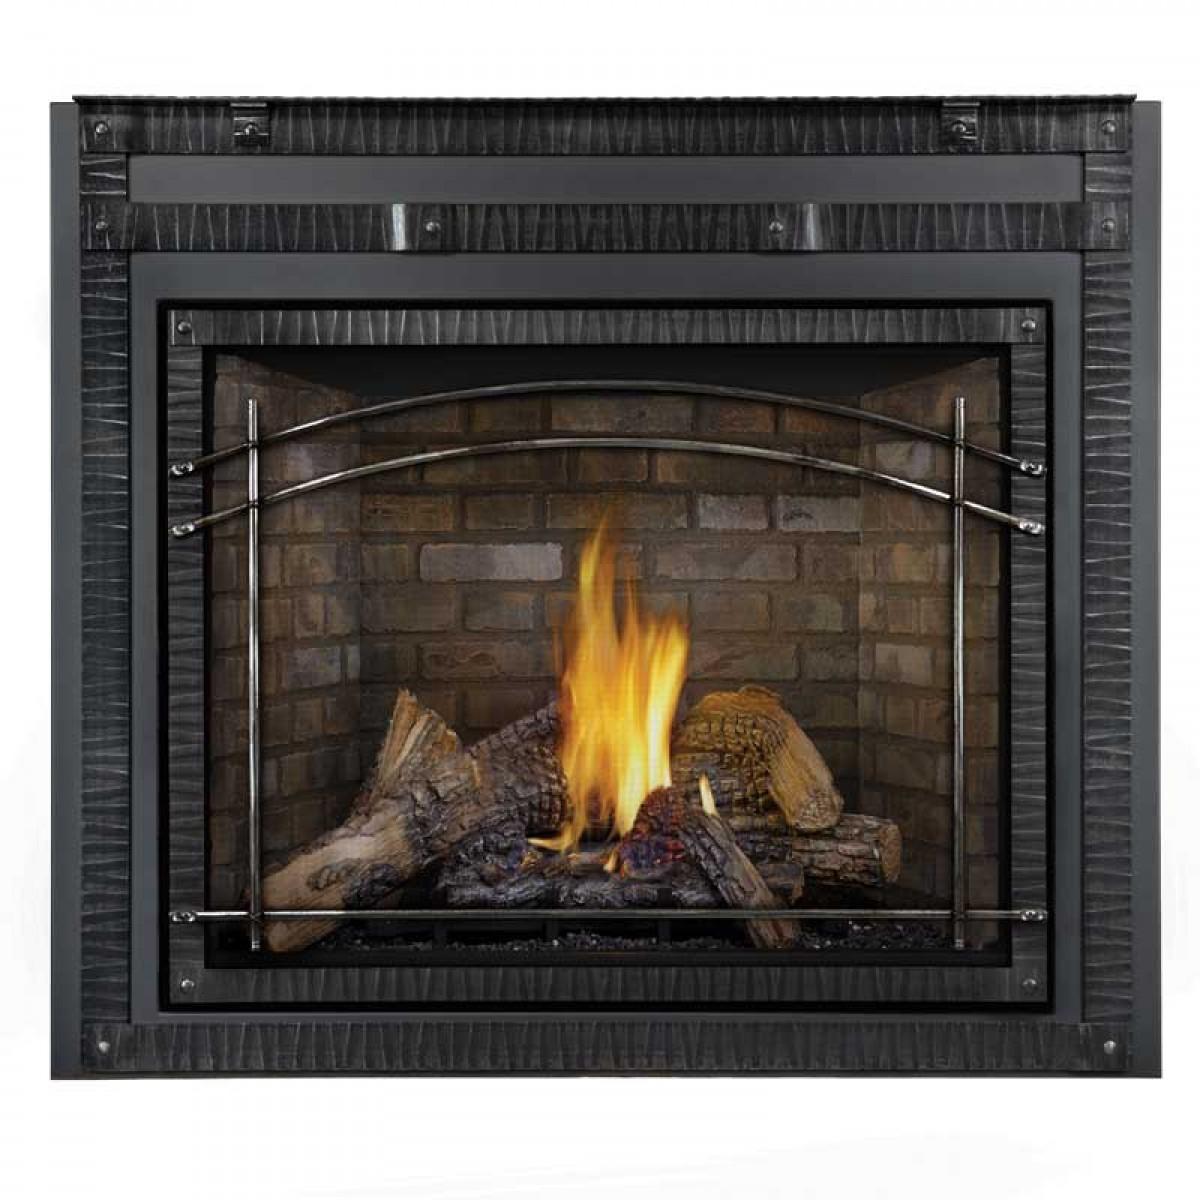 Napoleon Hdx40nt 1sb Direct Vent Top Natural Gas Fireplace W Black Door At Ibuyfireplaces